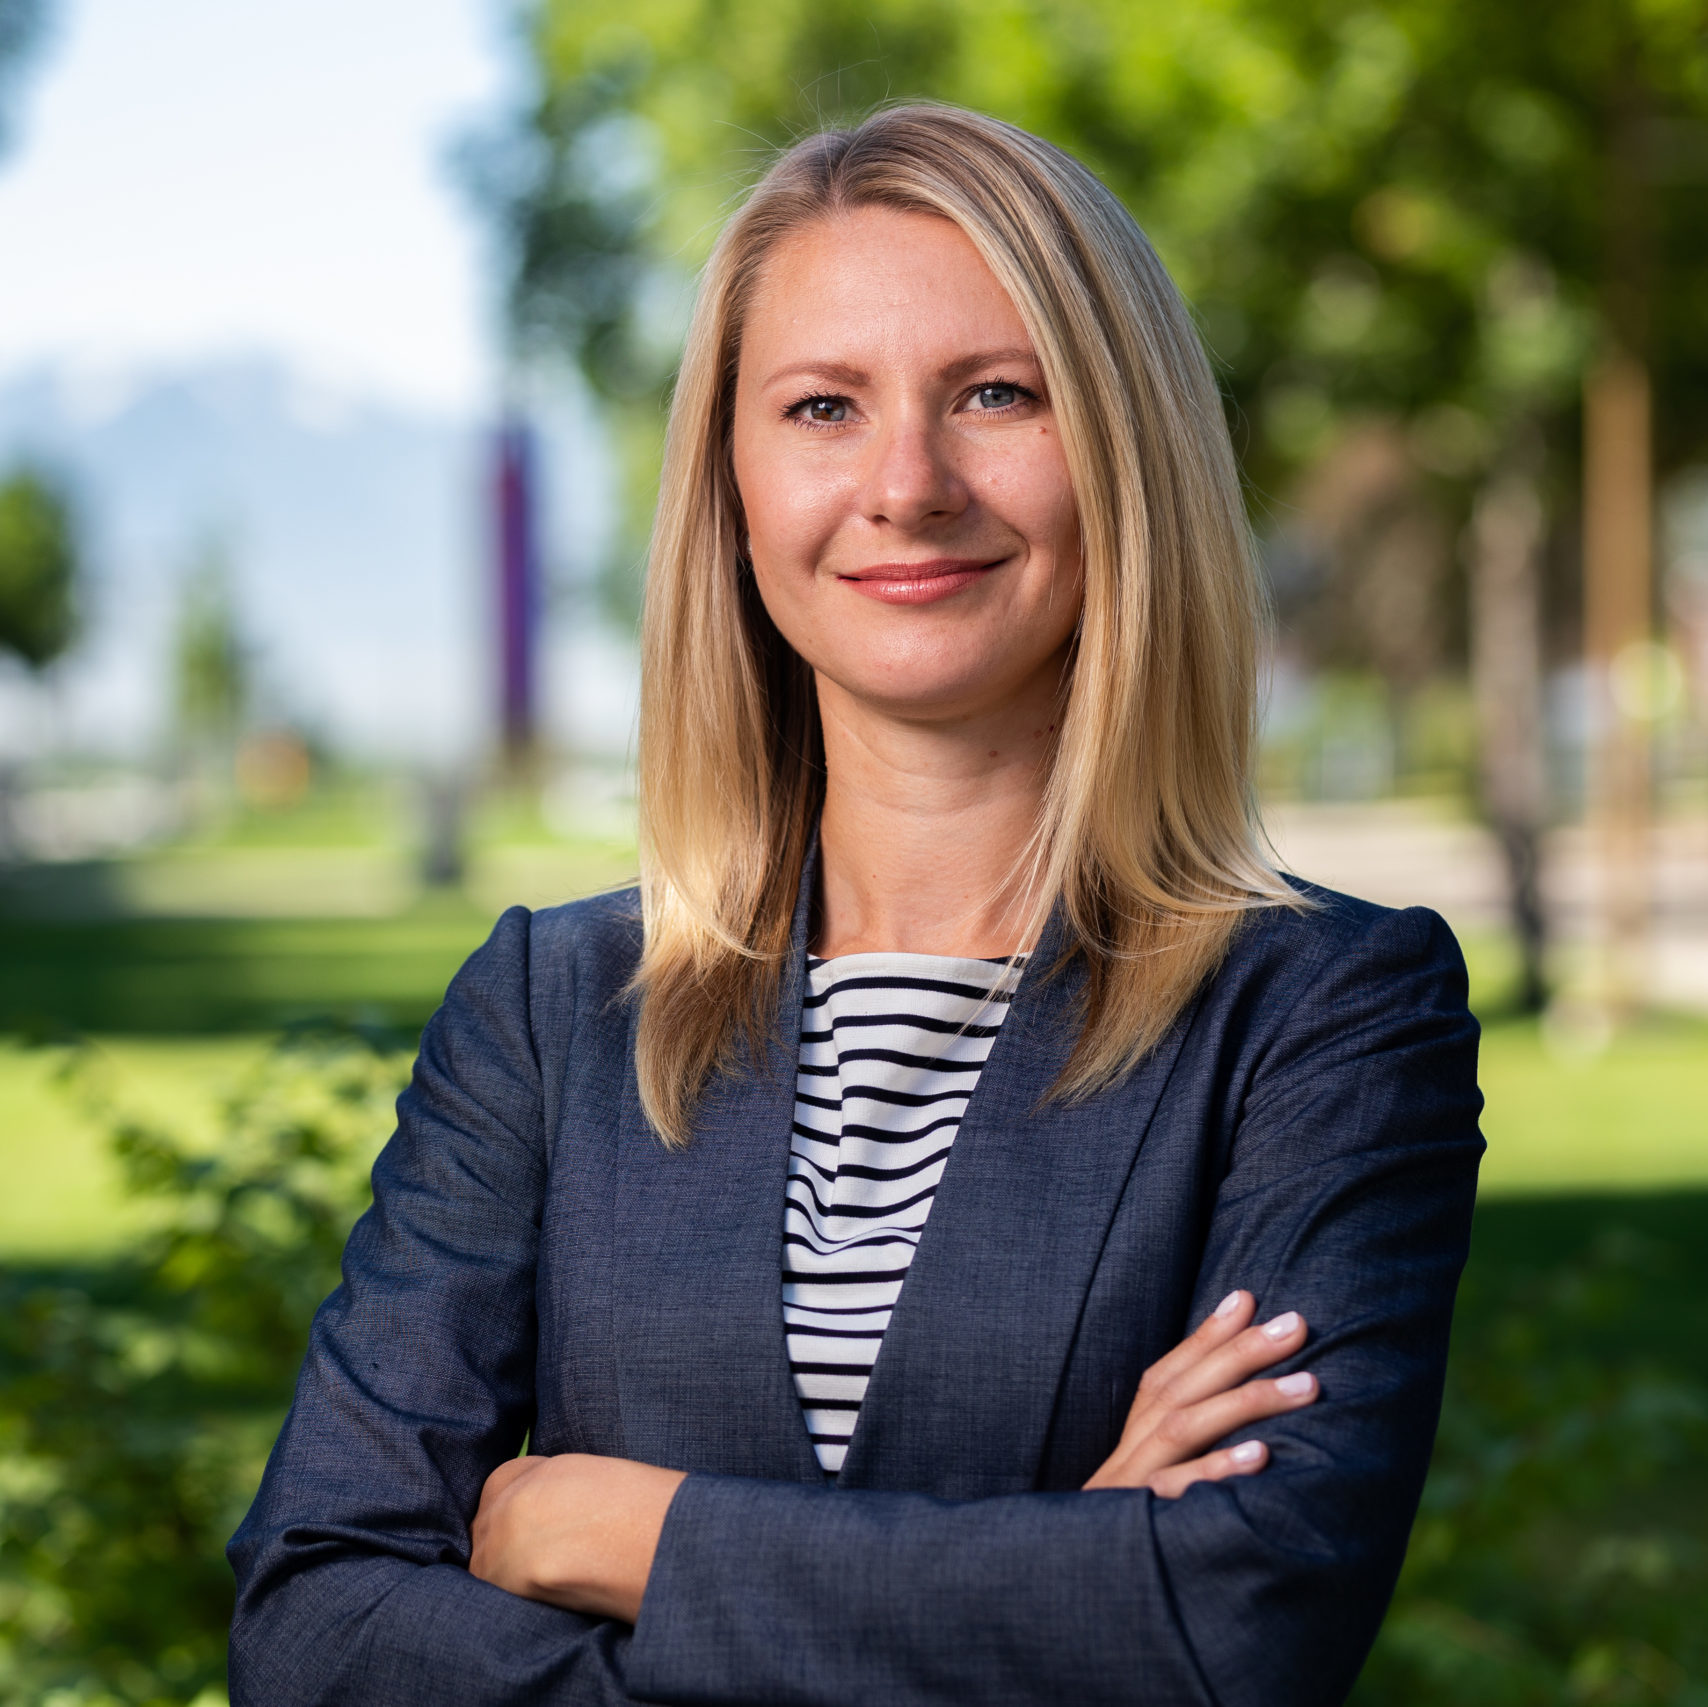 Olga Bio Pic